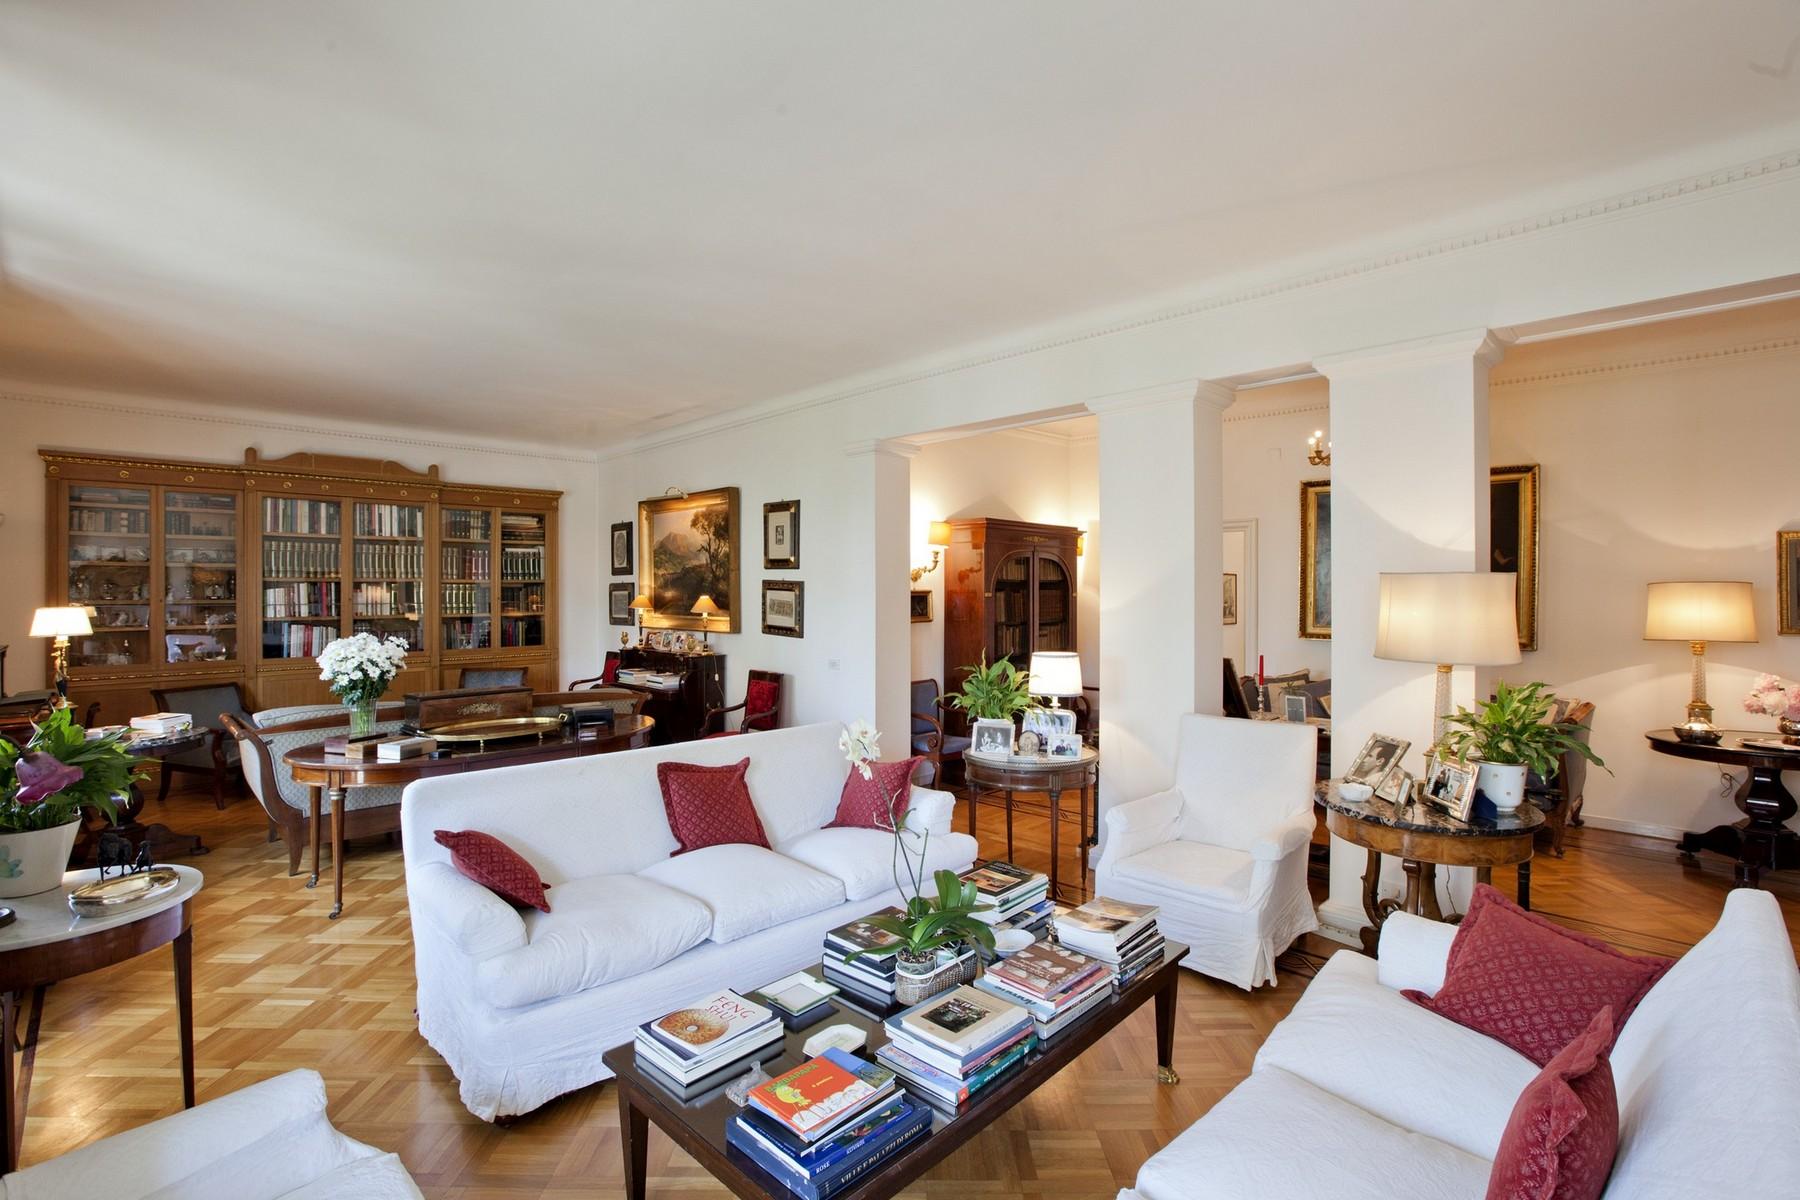 Apartment for Sale at Splendid Rome Apartment Pietro Antonio Micheli Rome, Rome, 00197 Italy